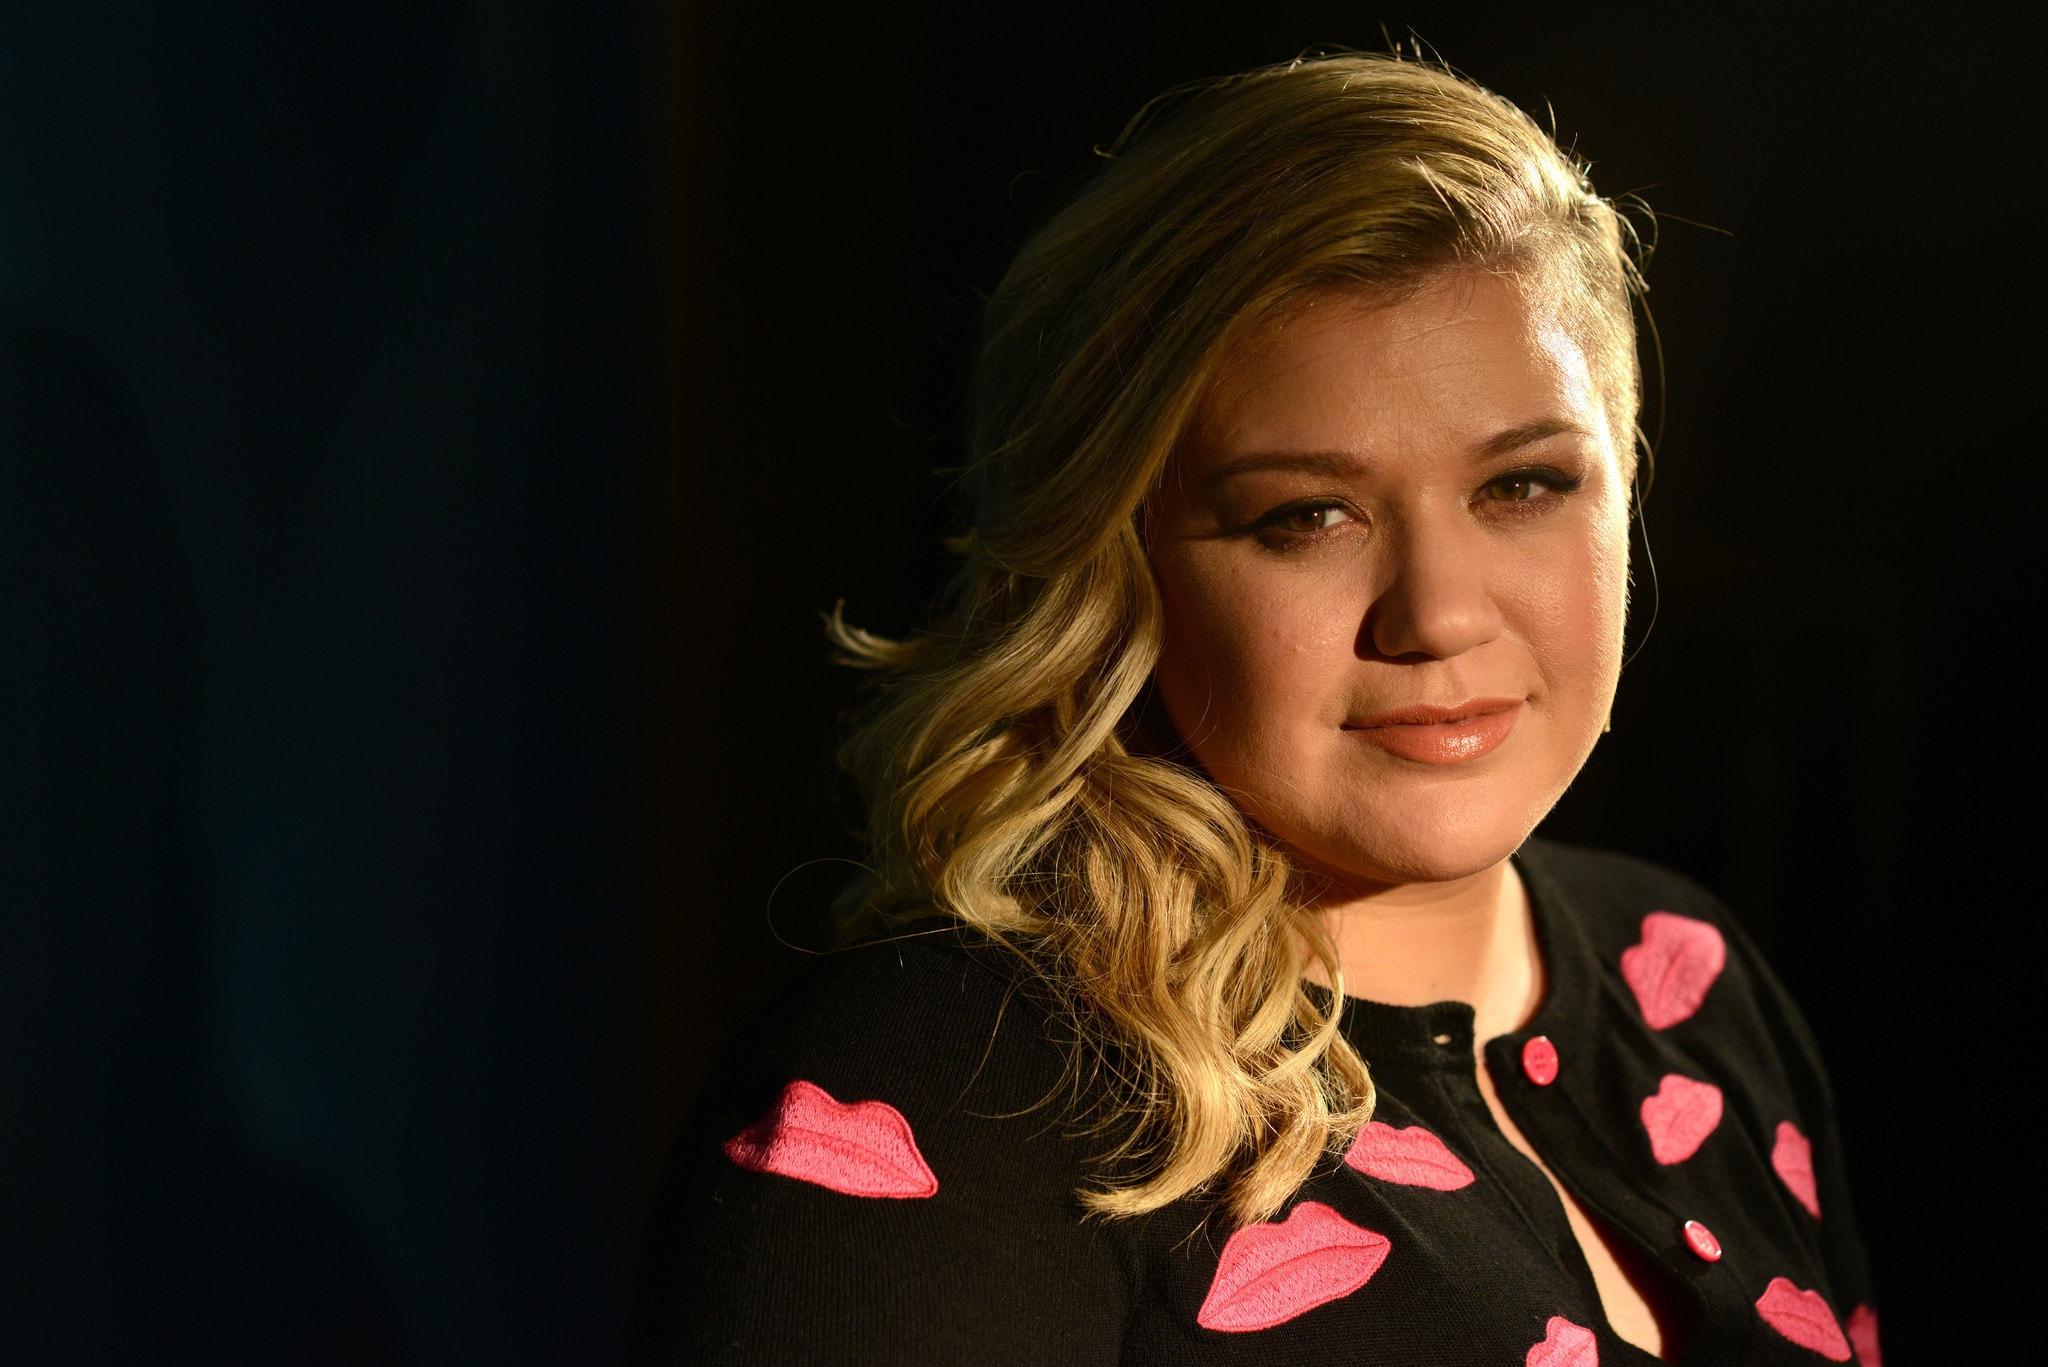 Kelly Clarkson Widescreen for desktop